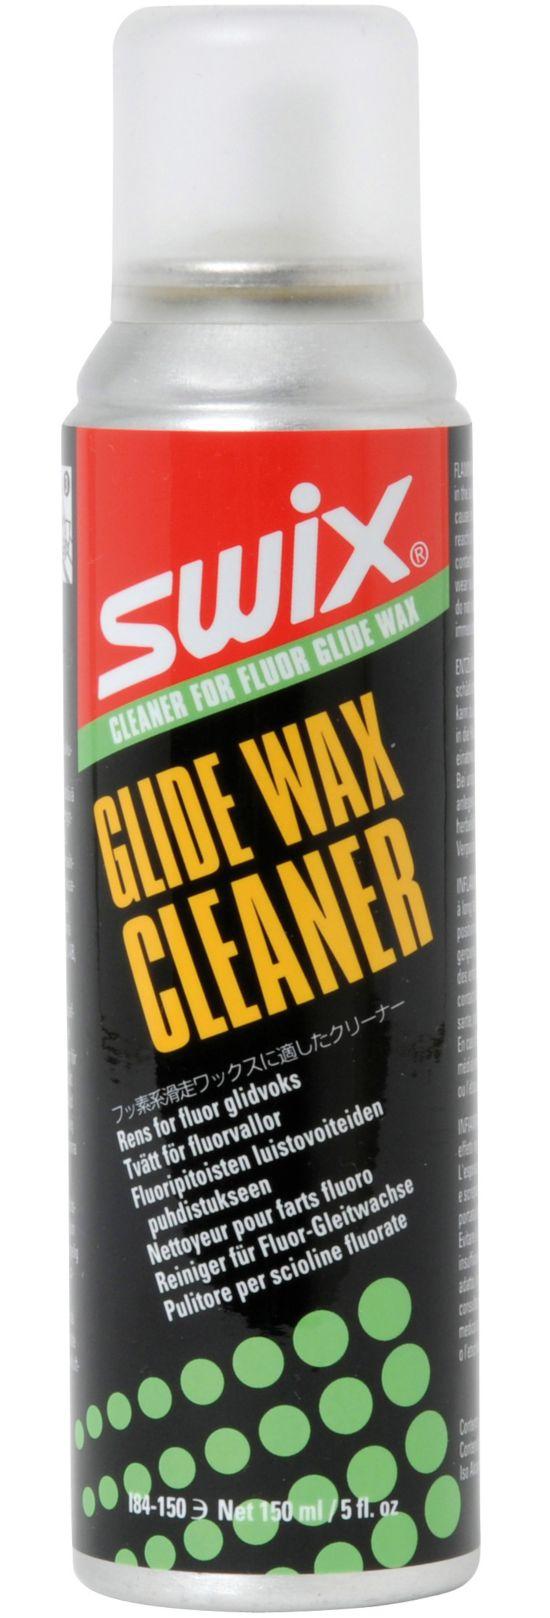 I84 Cleaner Fluoro Glidewax 15